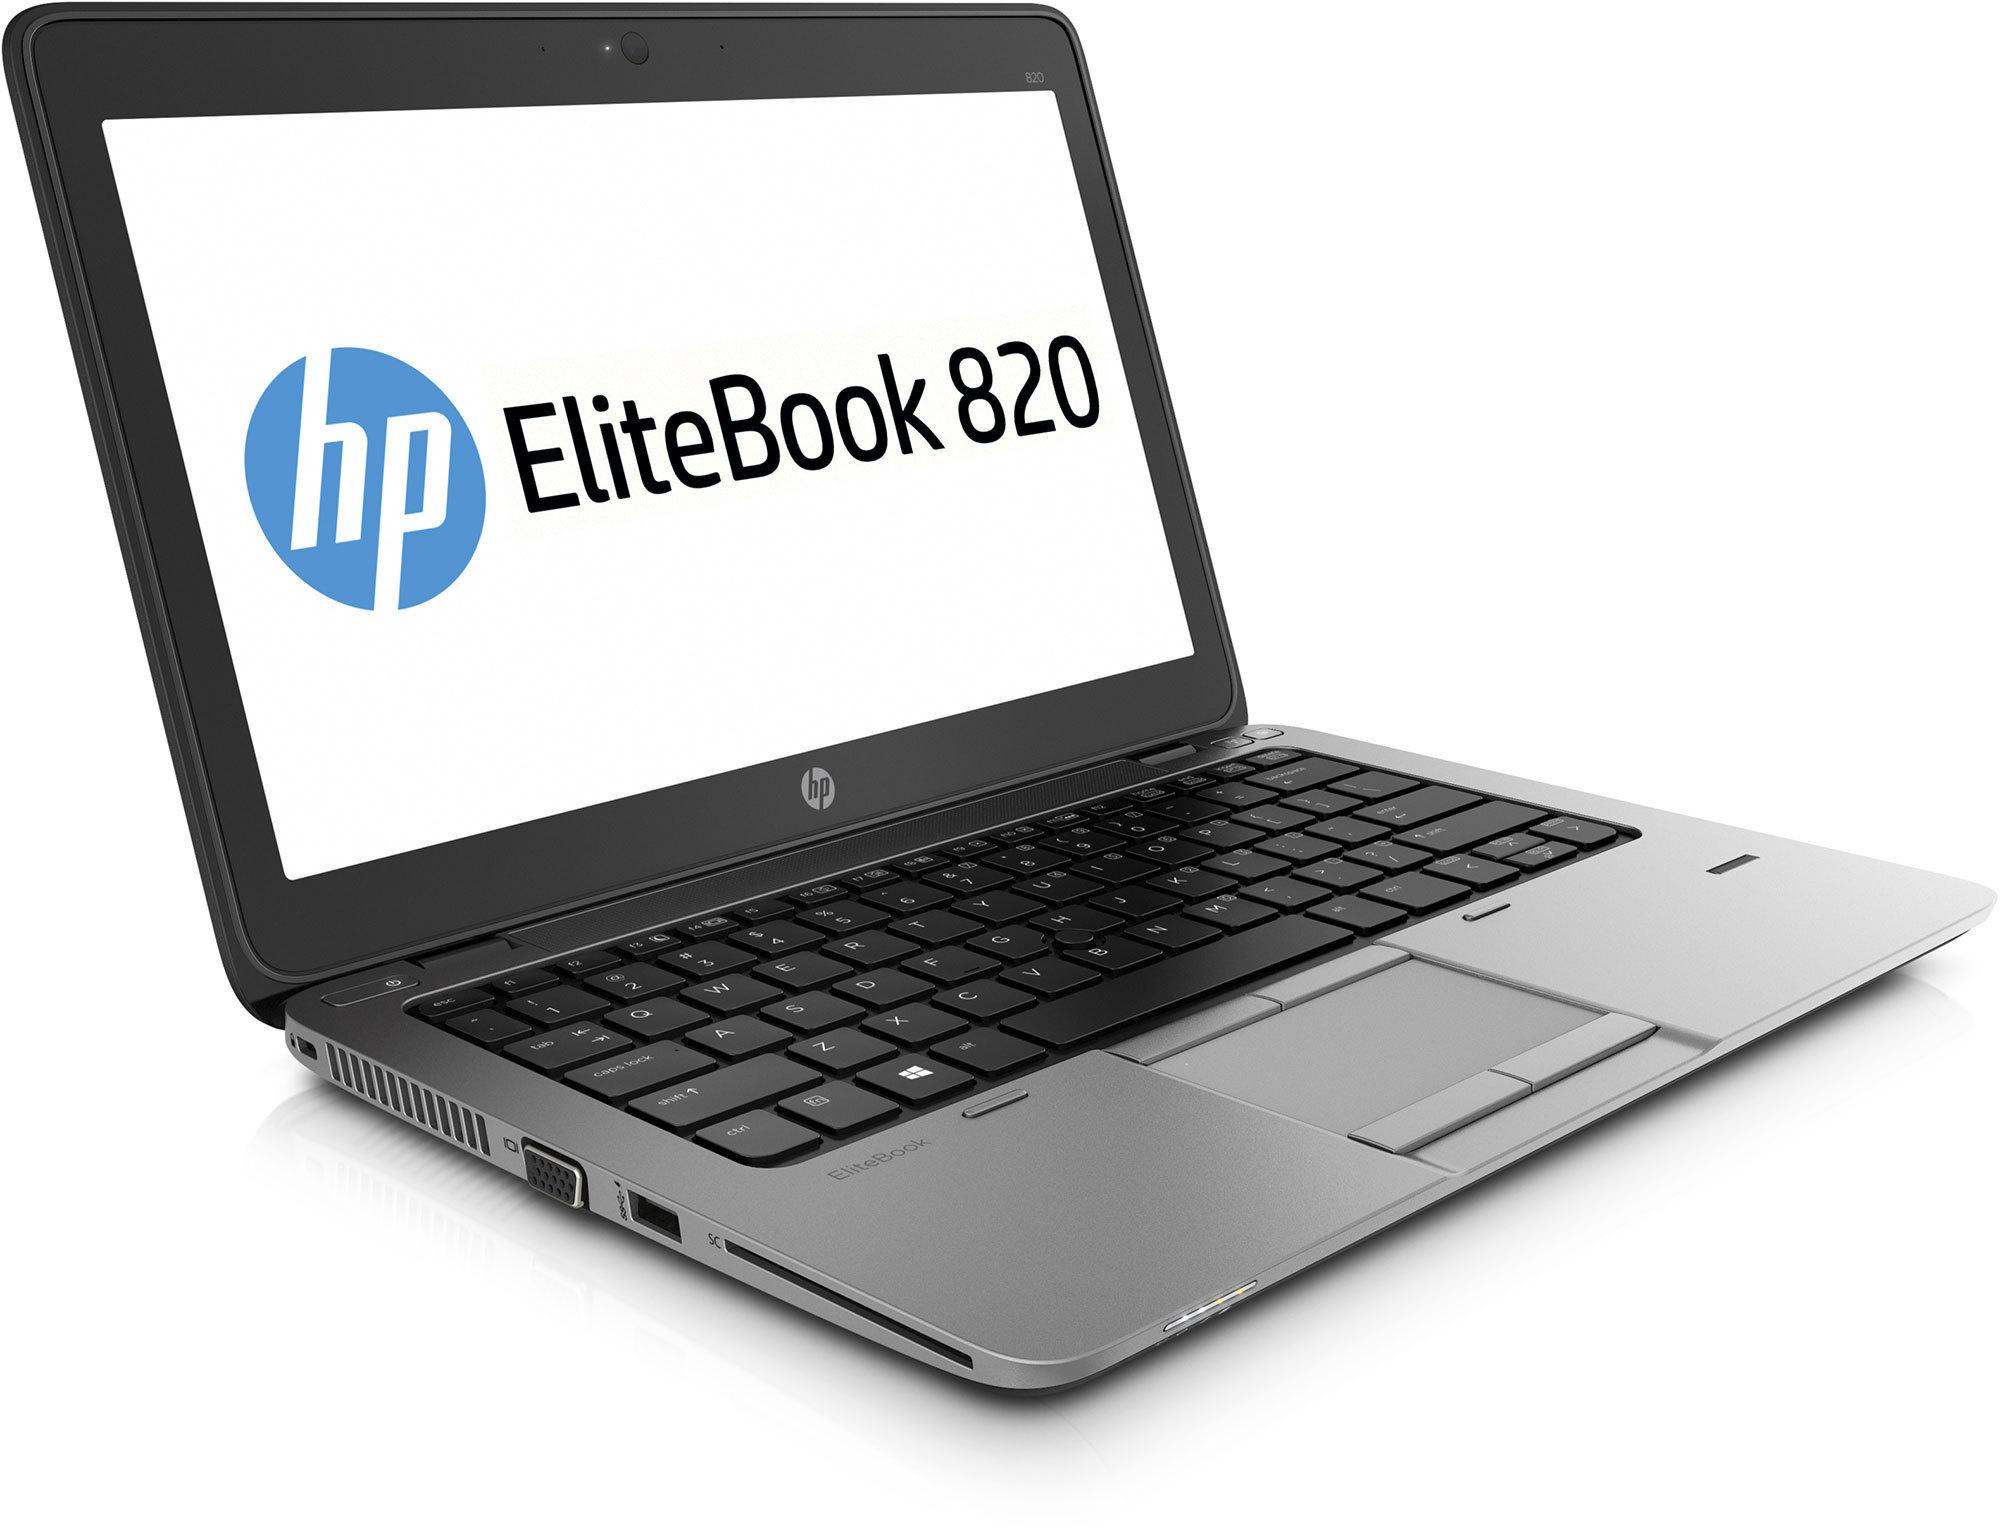 Hp elitebook 820 g1 12 5 kannettava win 7 pro 64 bit for 820 12